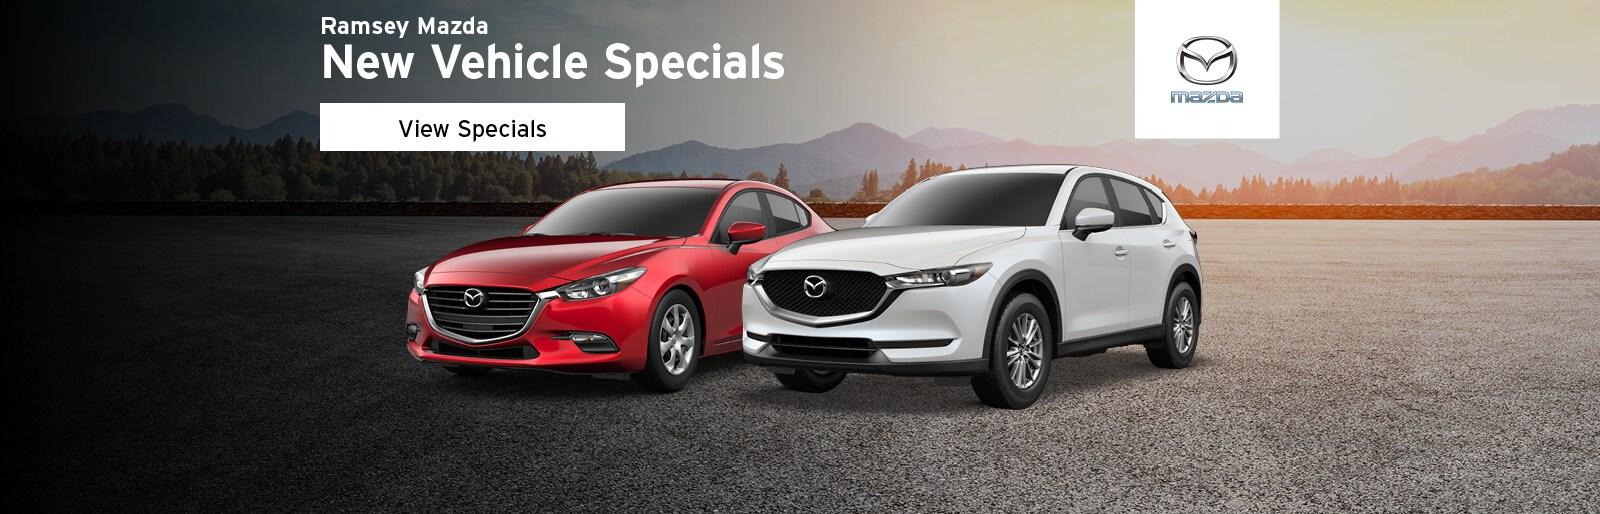 Ramsey Mazda | Urbandale, IA | New & Used Mazda Dealership